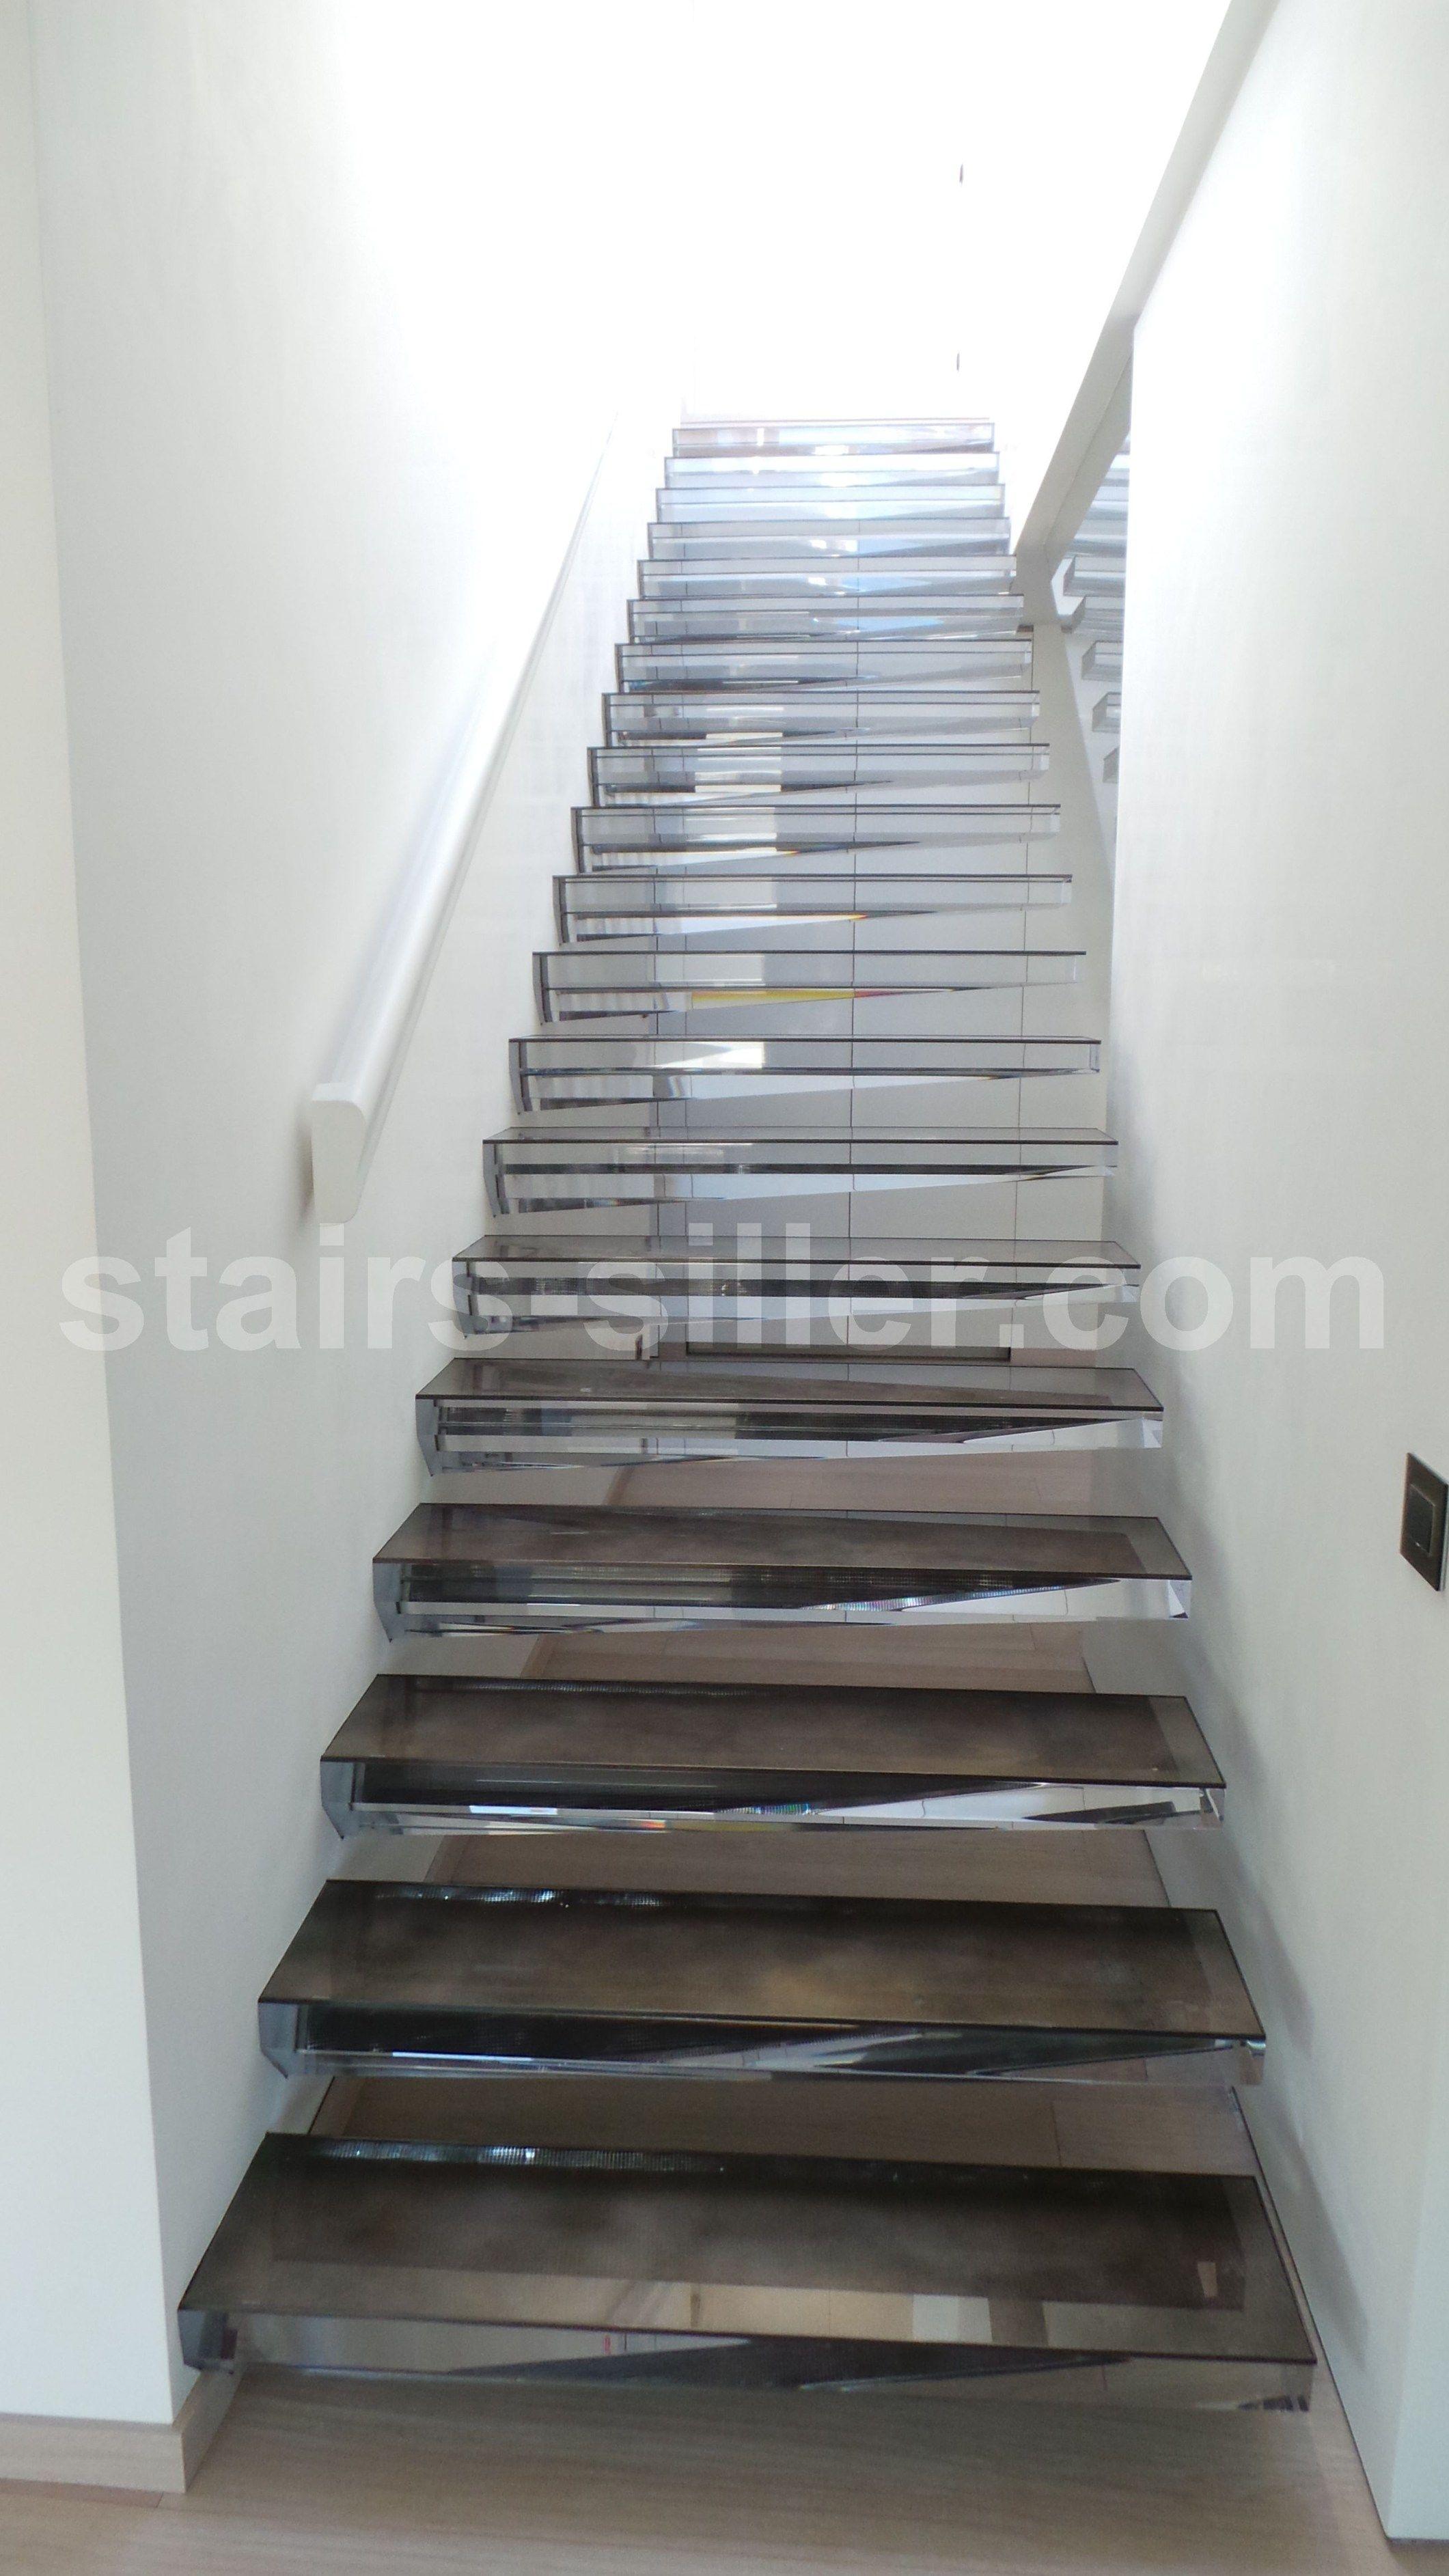 stairs in acrylic escalera volada de vidrio acrlico by siller treppen